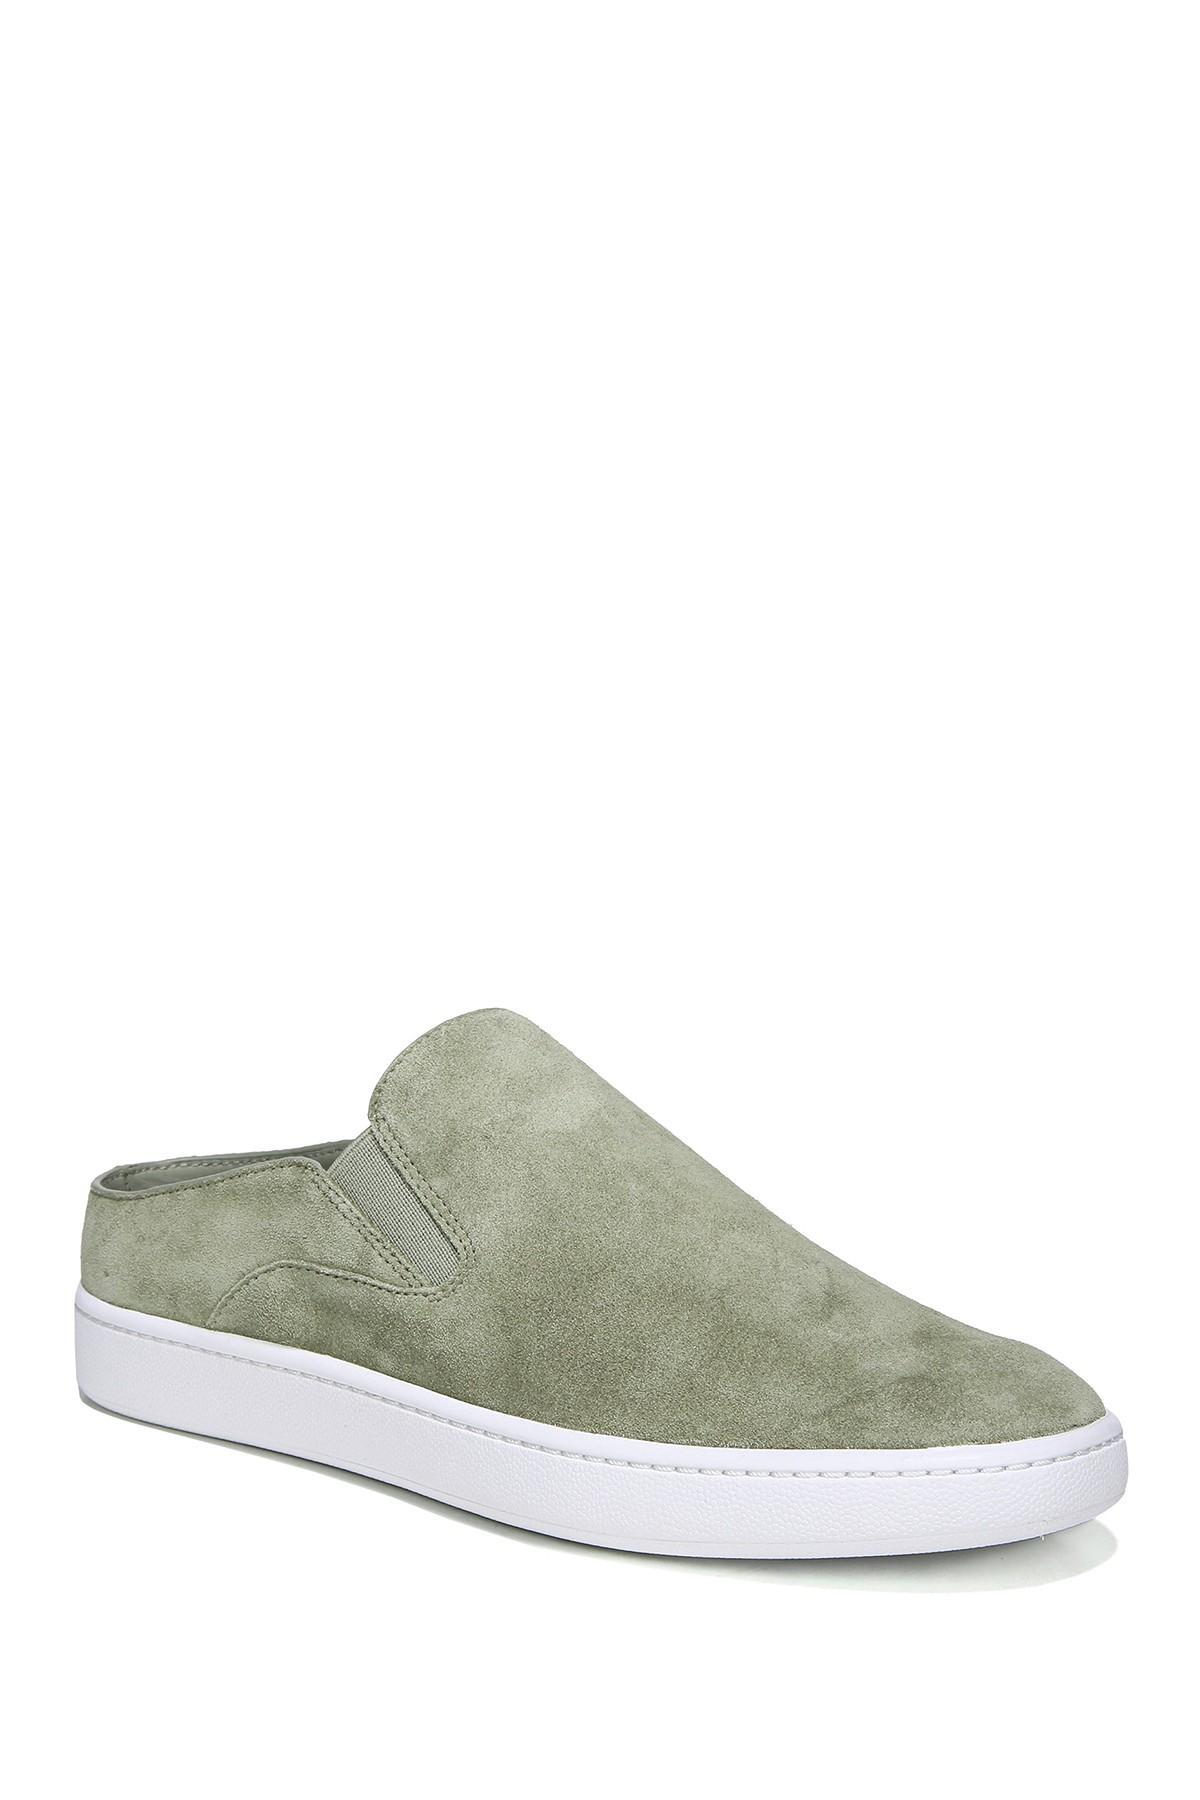 855fb8c79eb1 Lyst - Vince Verrell Slip-on Sneaker (women) in Green - Save ...